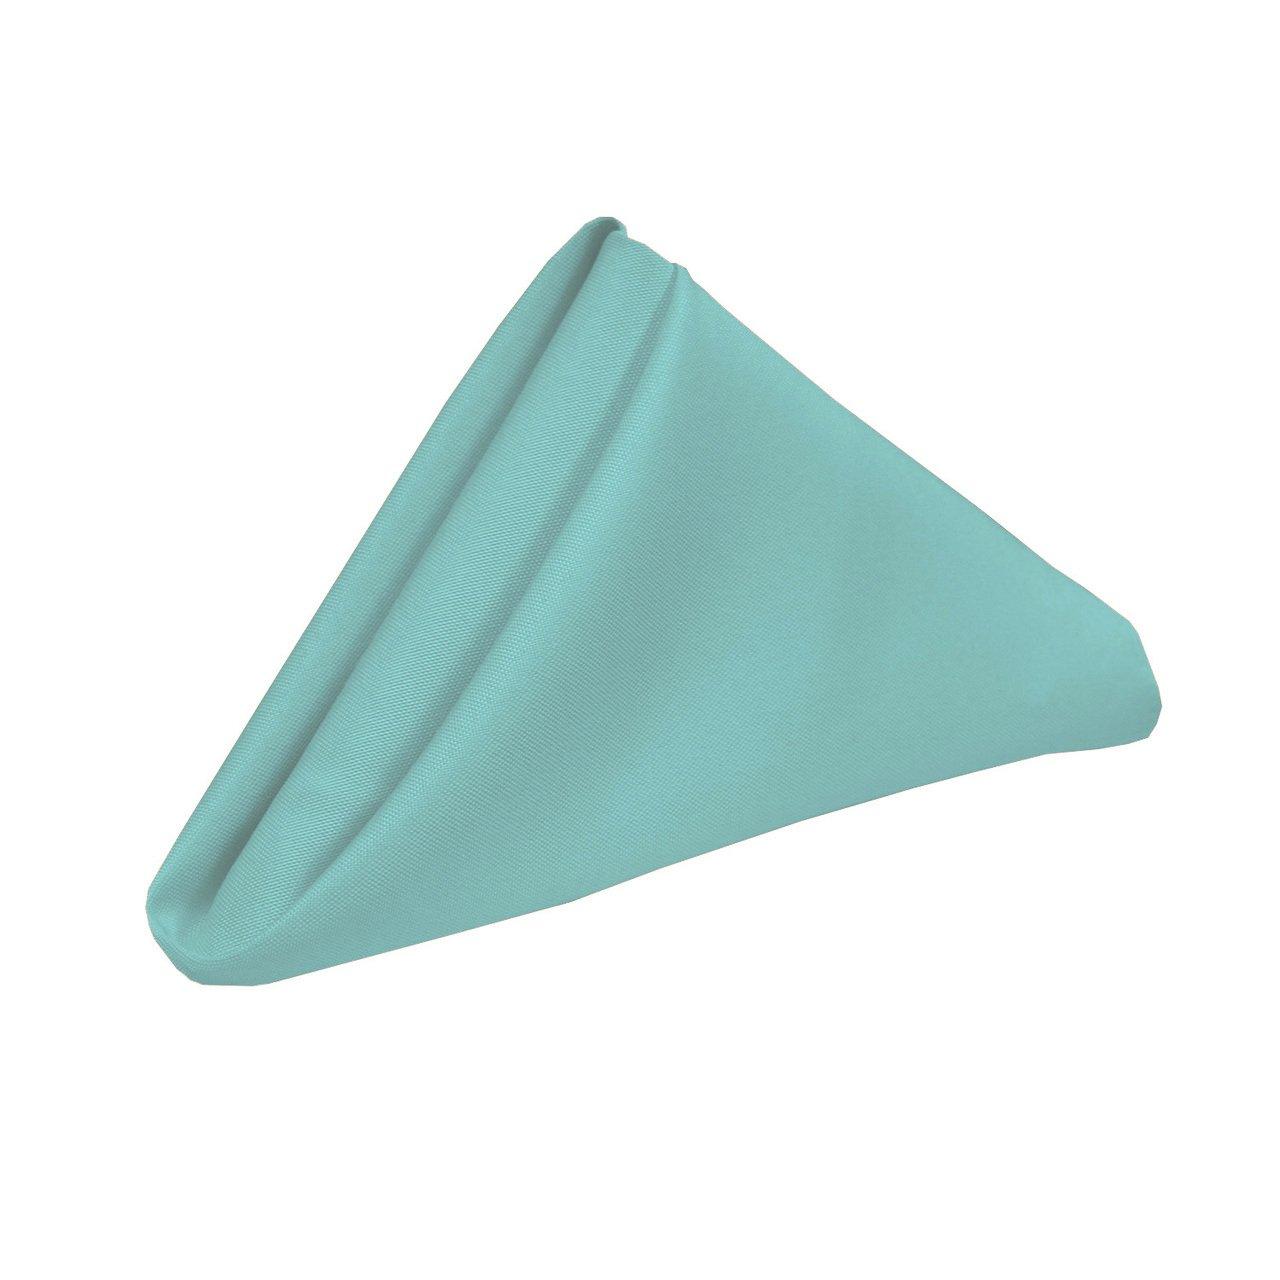 Your Chair Covers 20インチ ポリエステル 布ナプキン 結婚式 レストランナプキン用 10個パック ブルー  Robin Egg B017KSYD8E